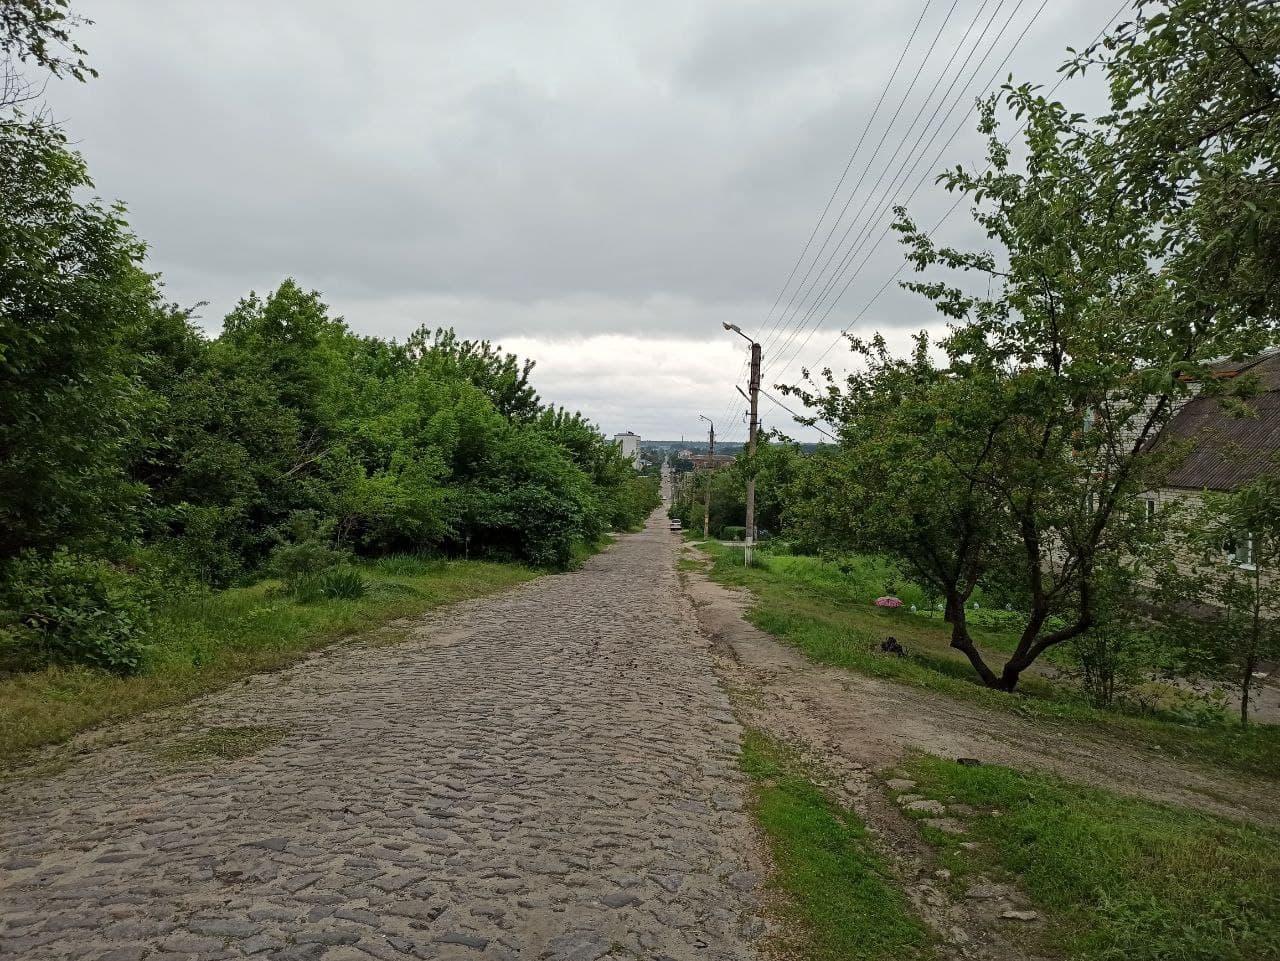 photo_2021-06-01_15-37-51.jpg